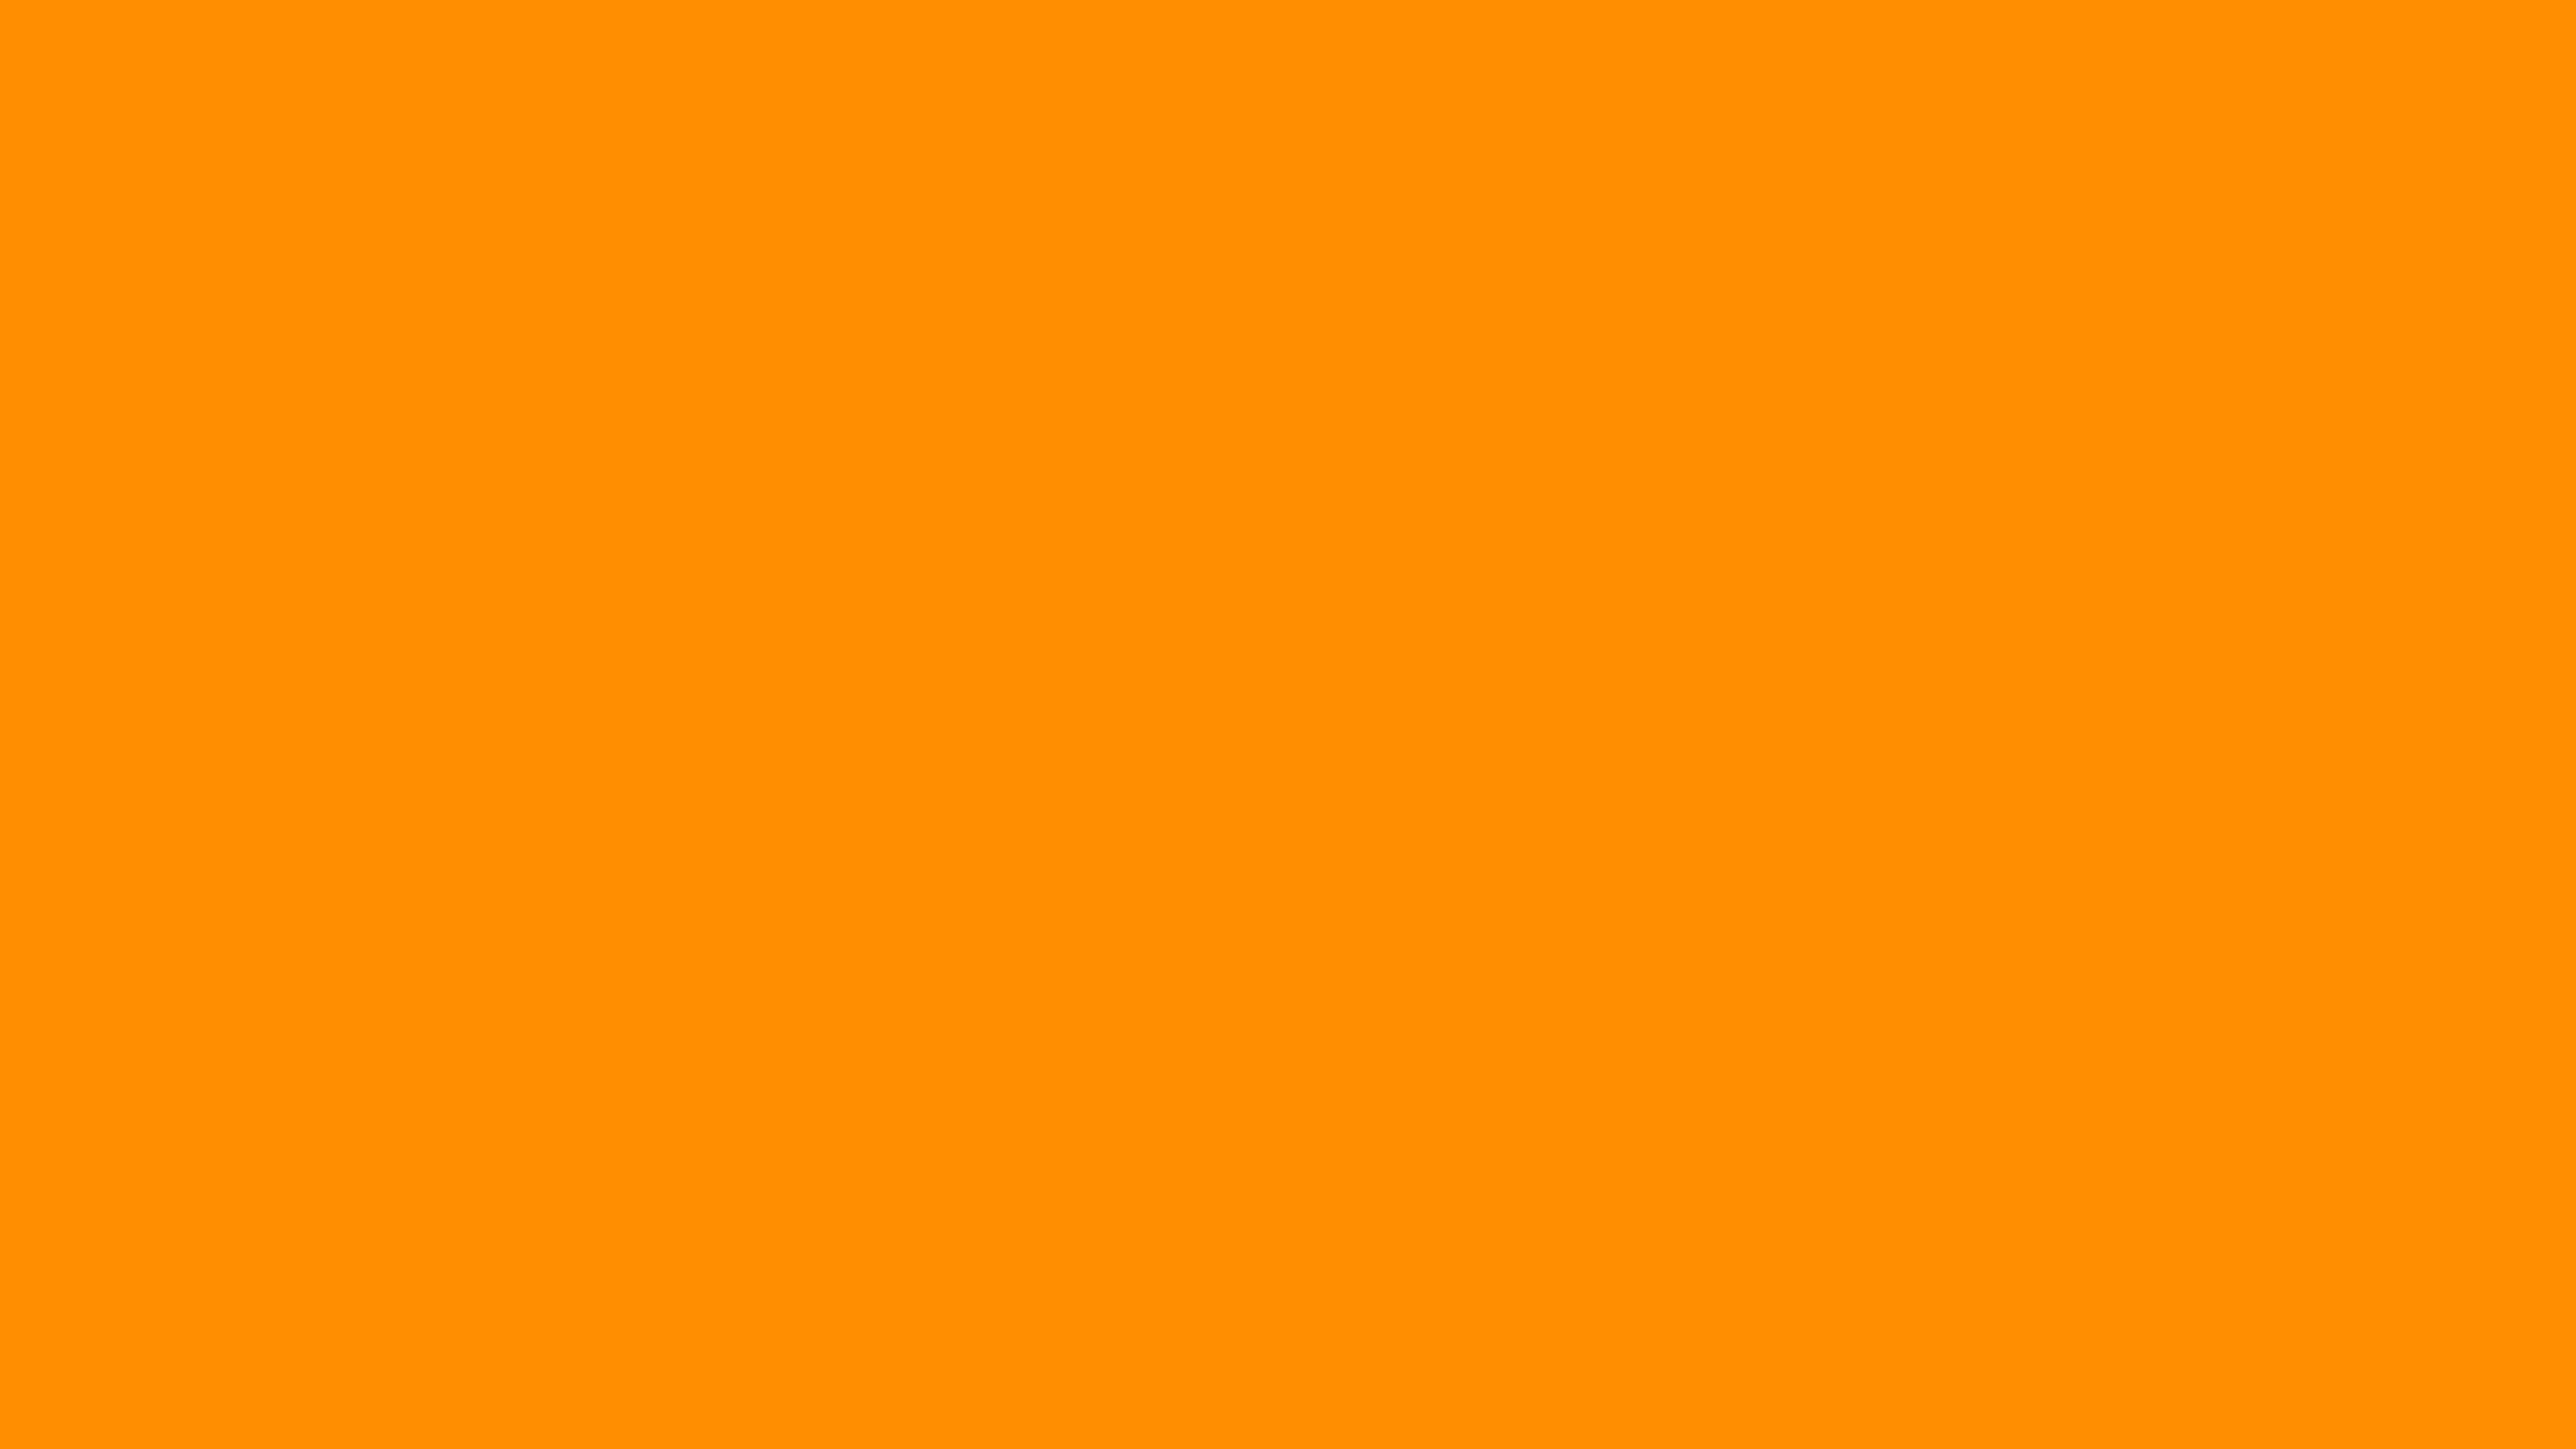 4096x2304 Princeton Orange Solid Color Background